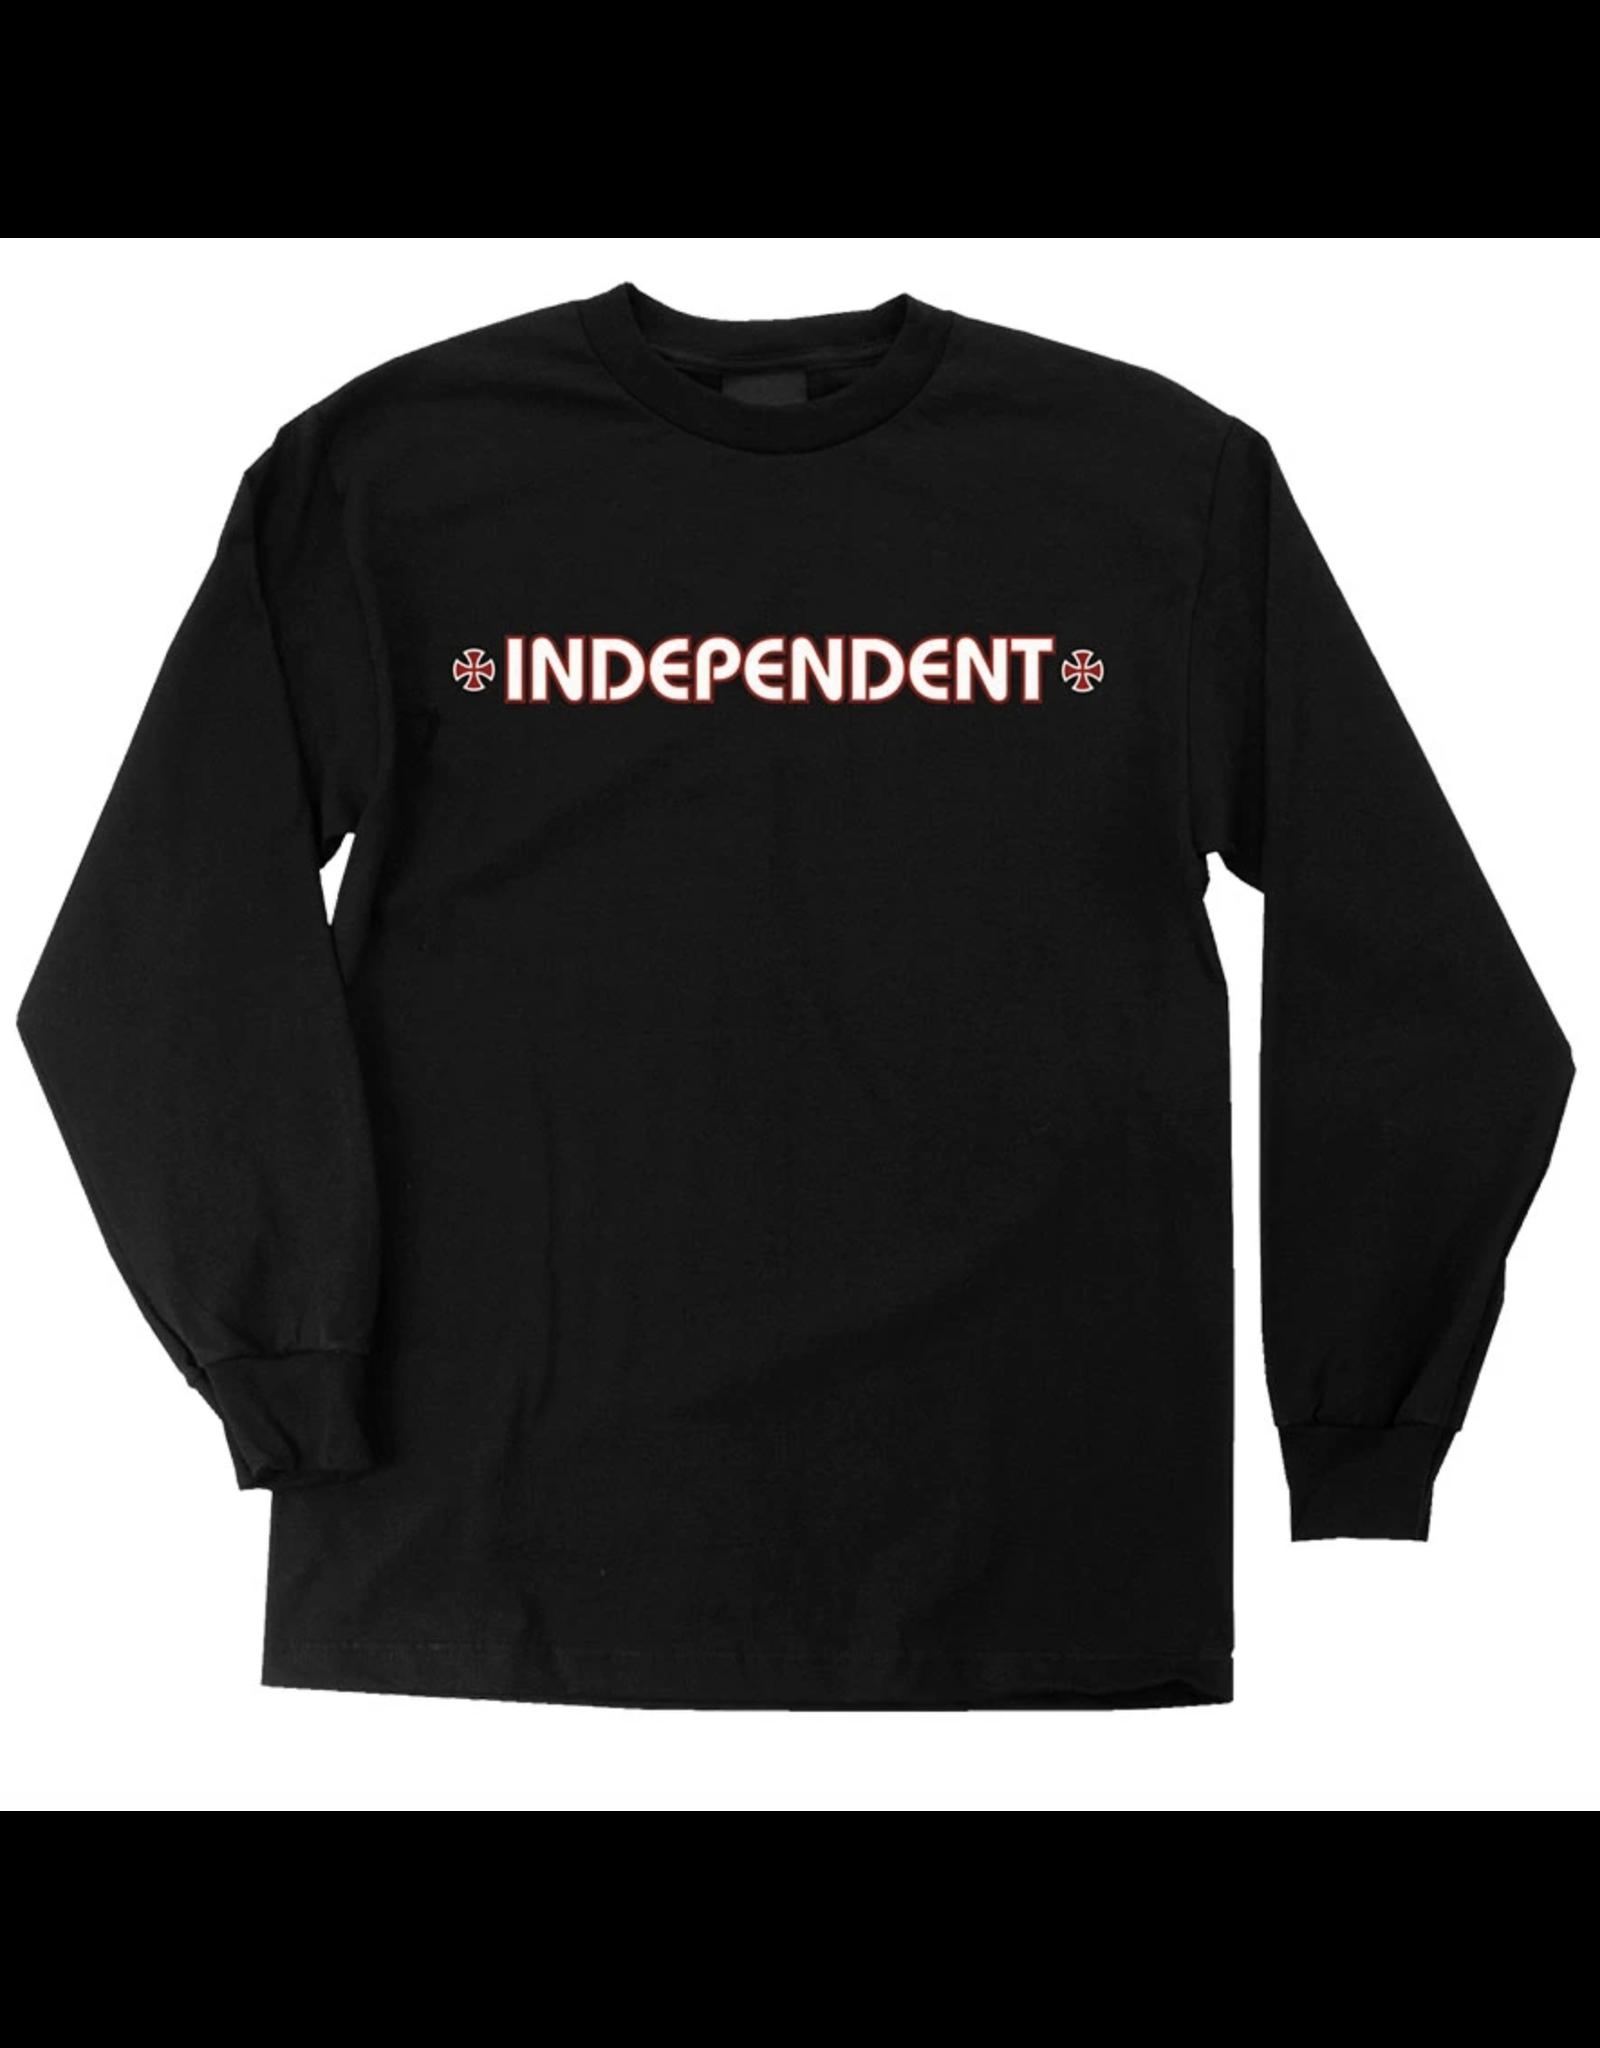 Independent Youth Bar/Cross Longsleeve - Black